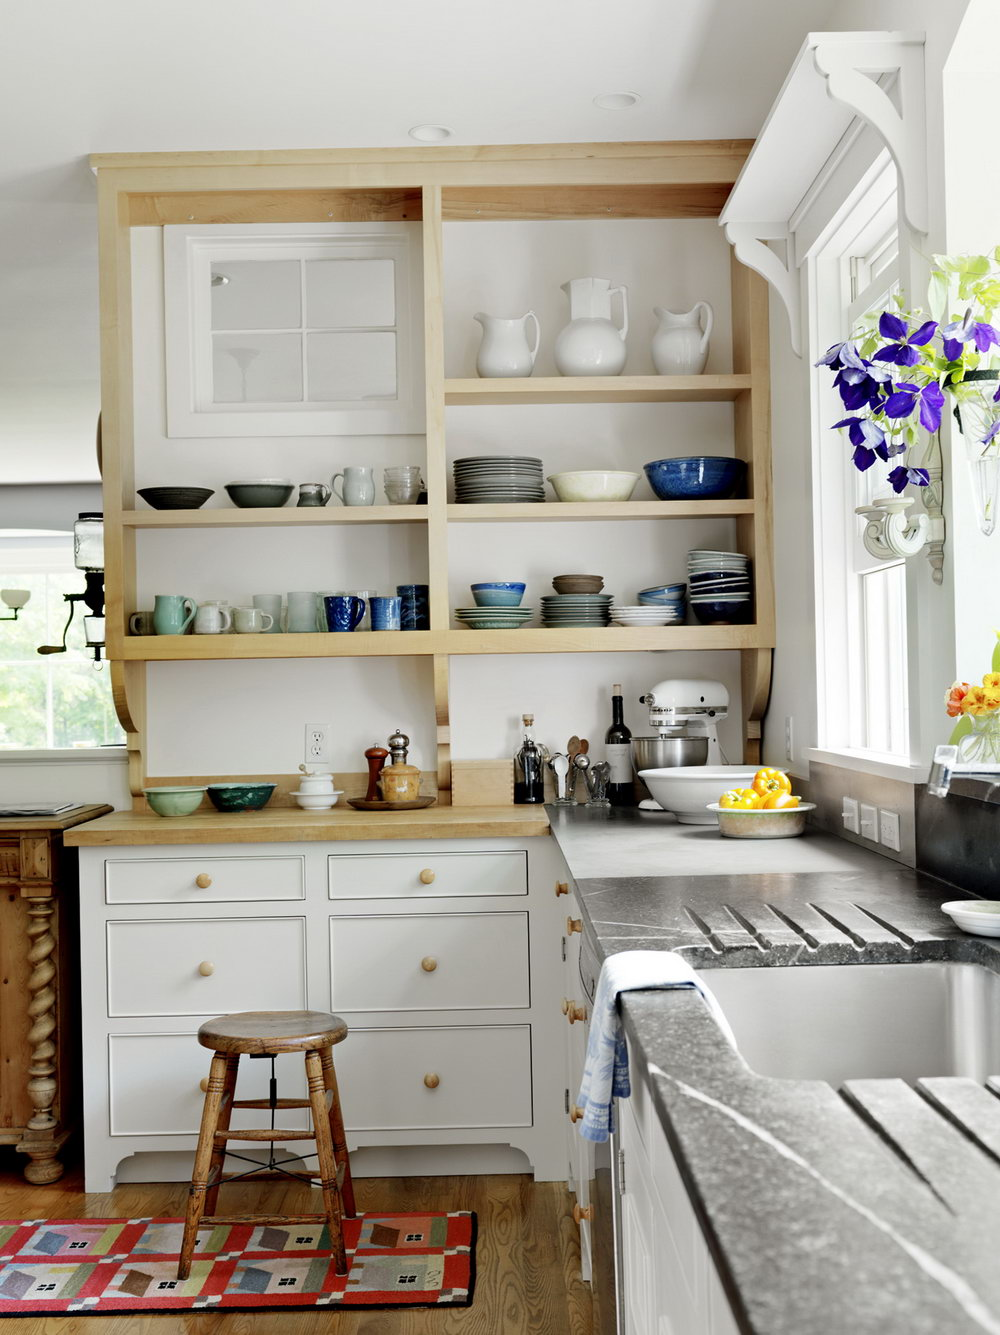 Painting Ikea Kitchen Cabinets Uk